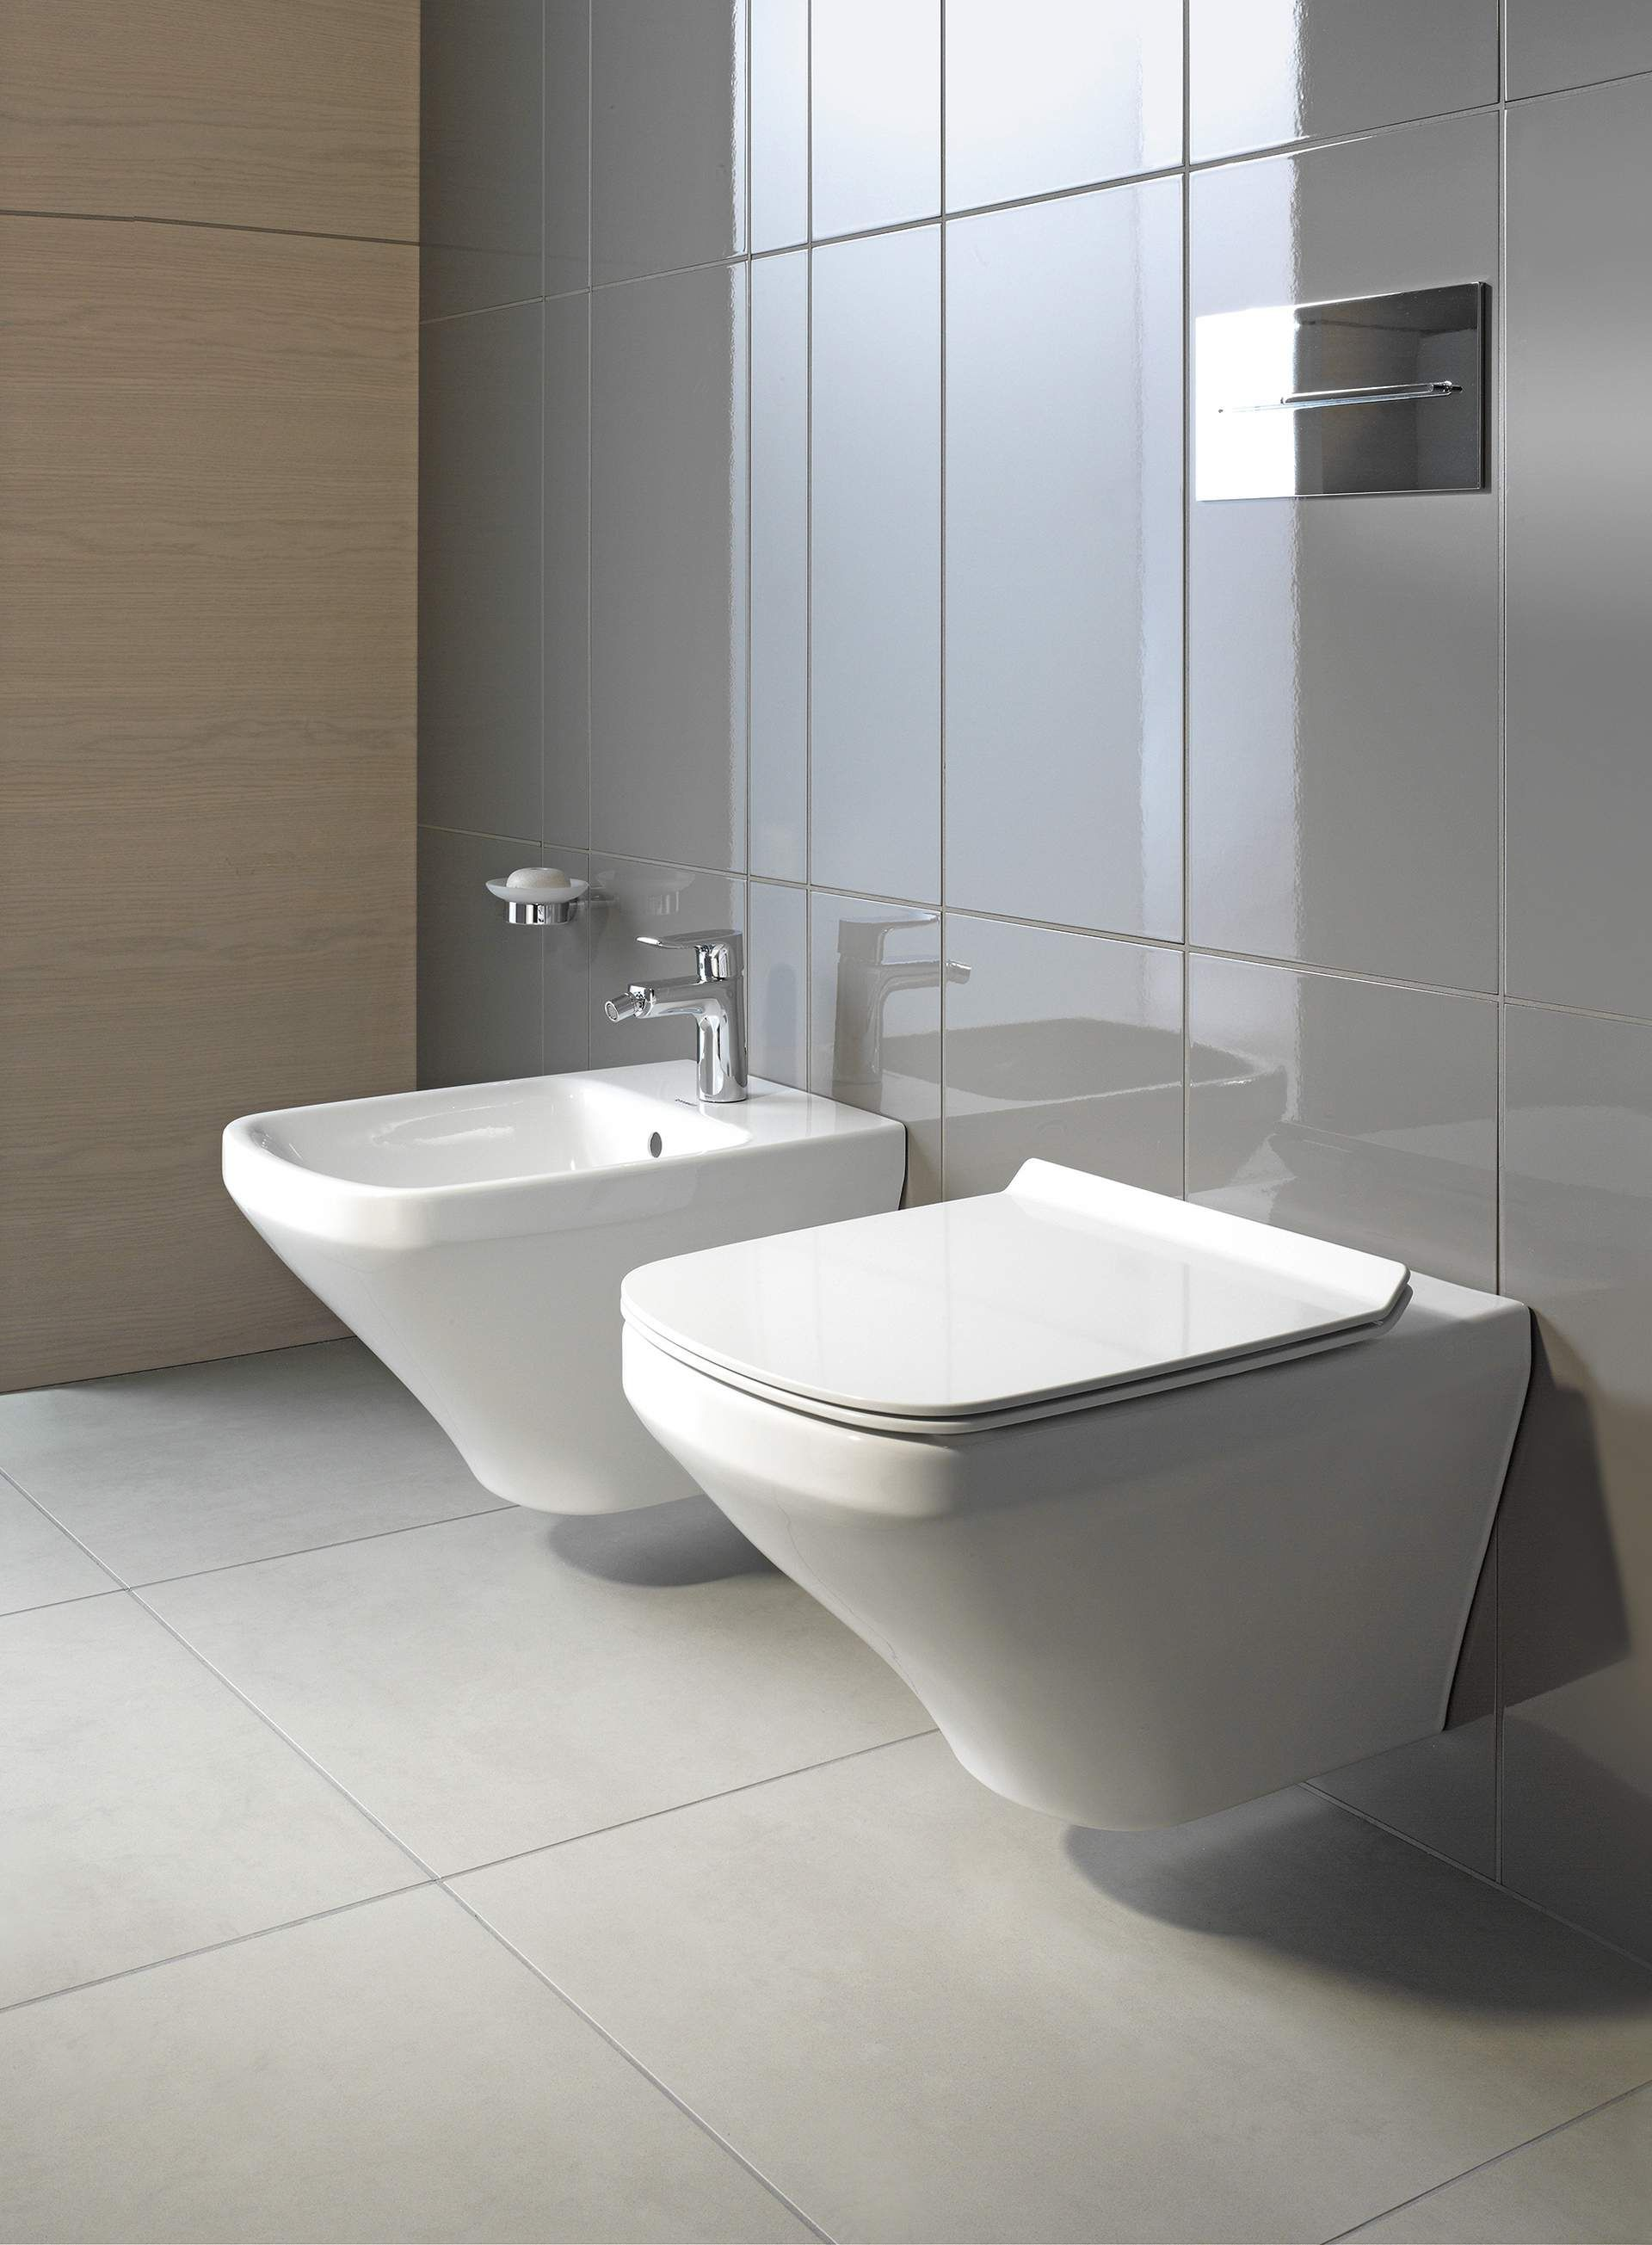 Durastyle Toilet Wall Mounted 253759 Duravit Toilet Wall